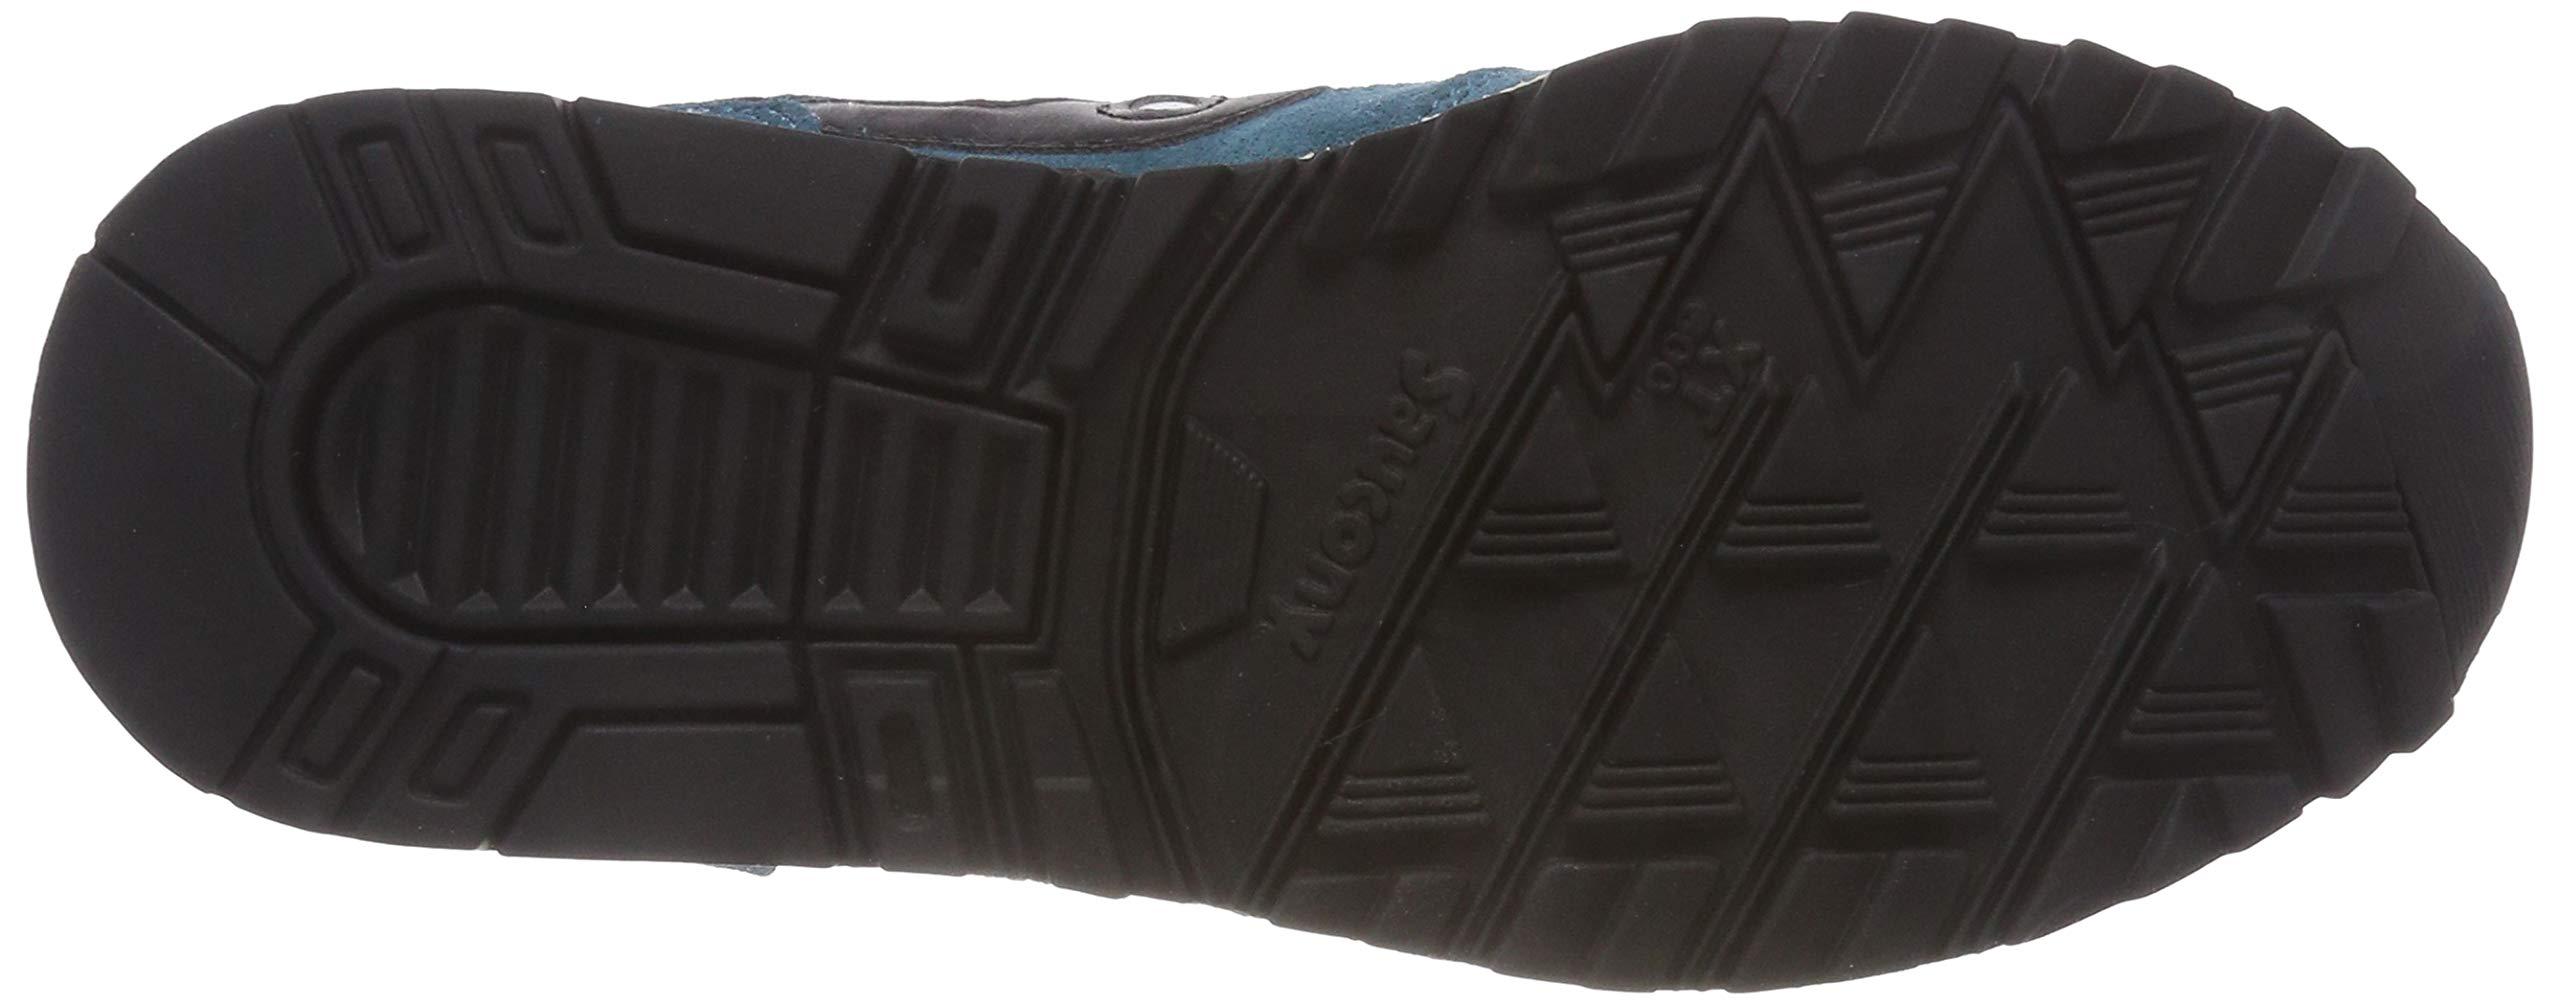 Saucony Shadow 5000 Vintage, Scarpe da Ginnastica Basse Unisex – Adulto 3 spesavip